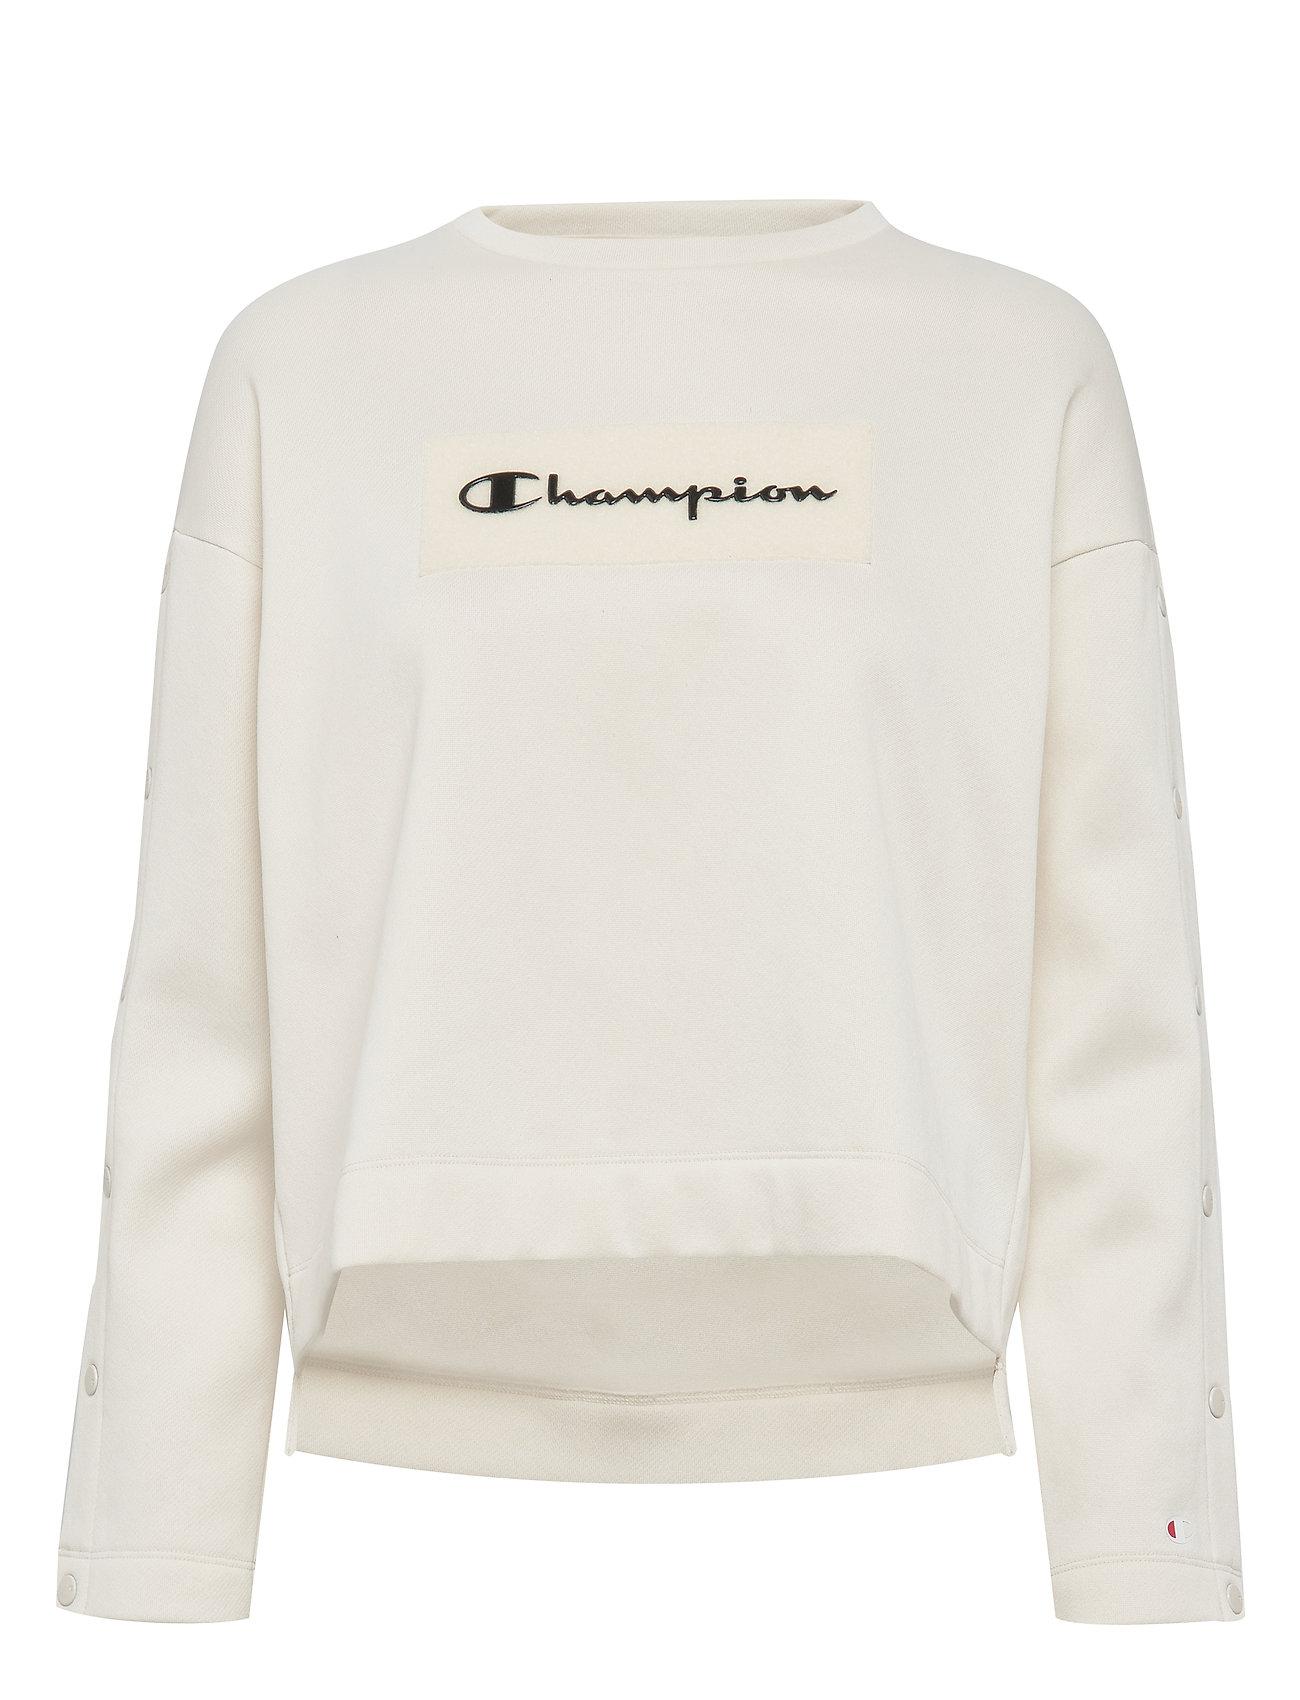 Champion Crewneck Sweatshirt - VAPOROUS GRAY